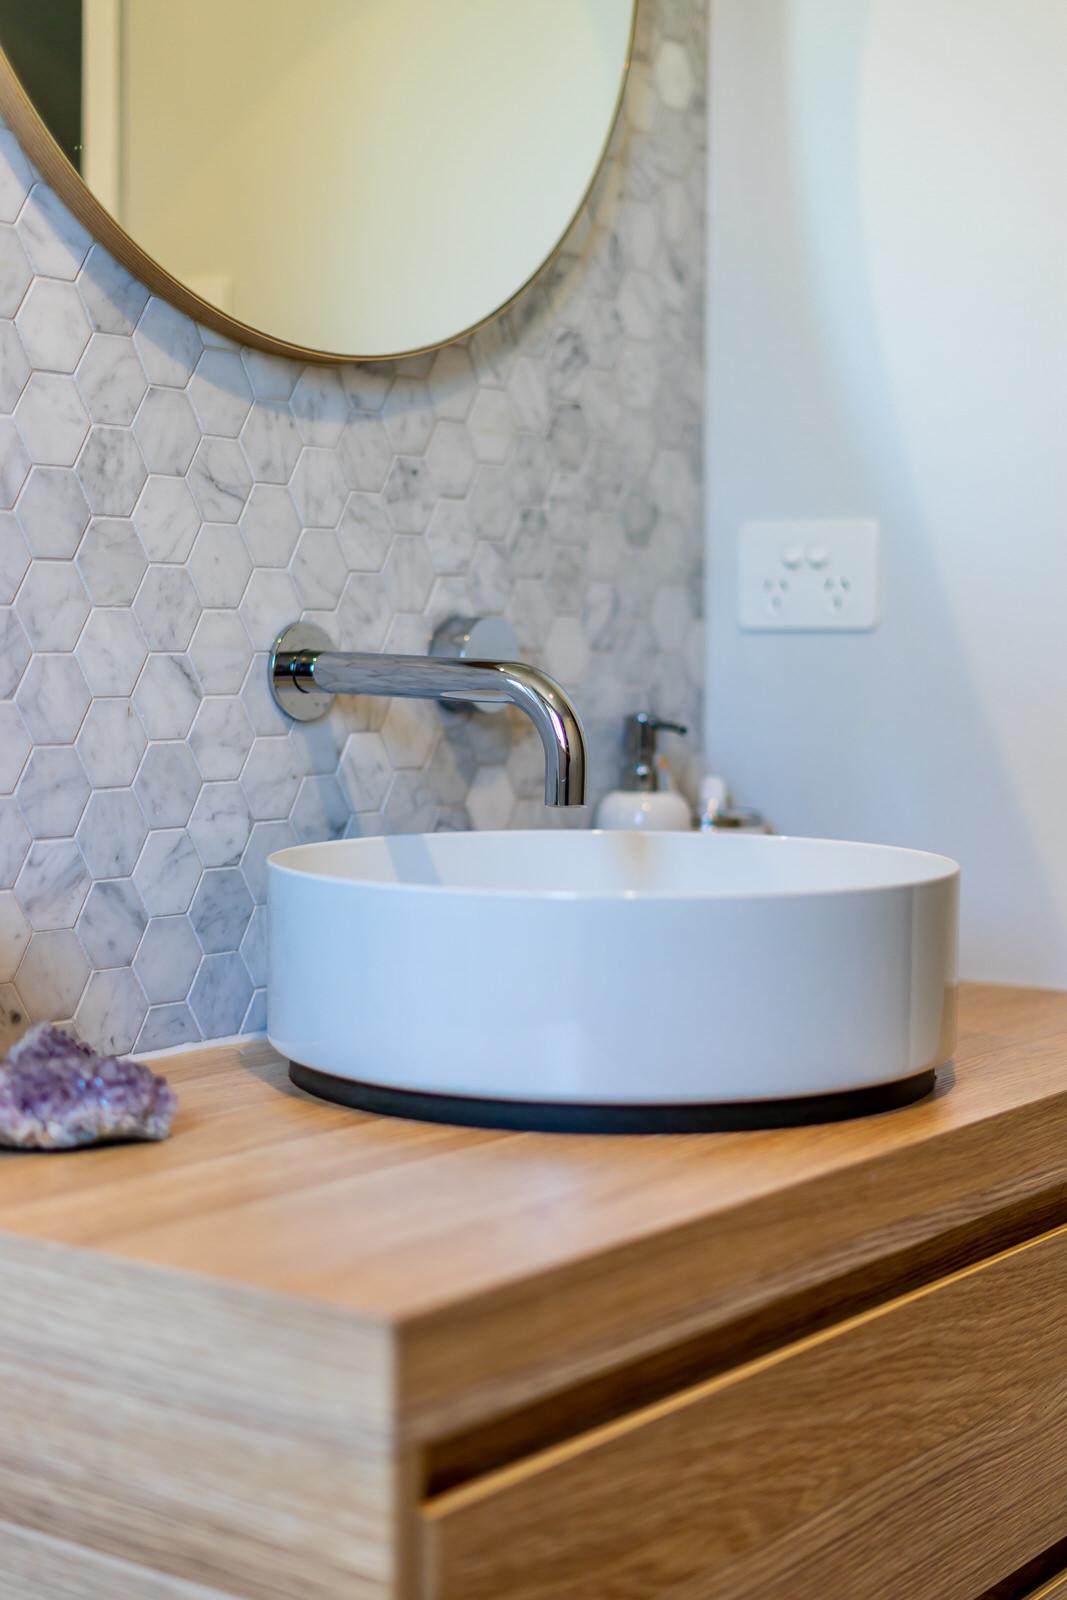 sink closeup in bathroom renovation